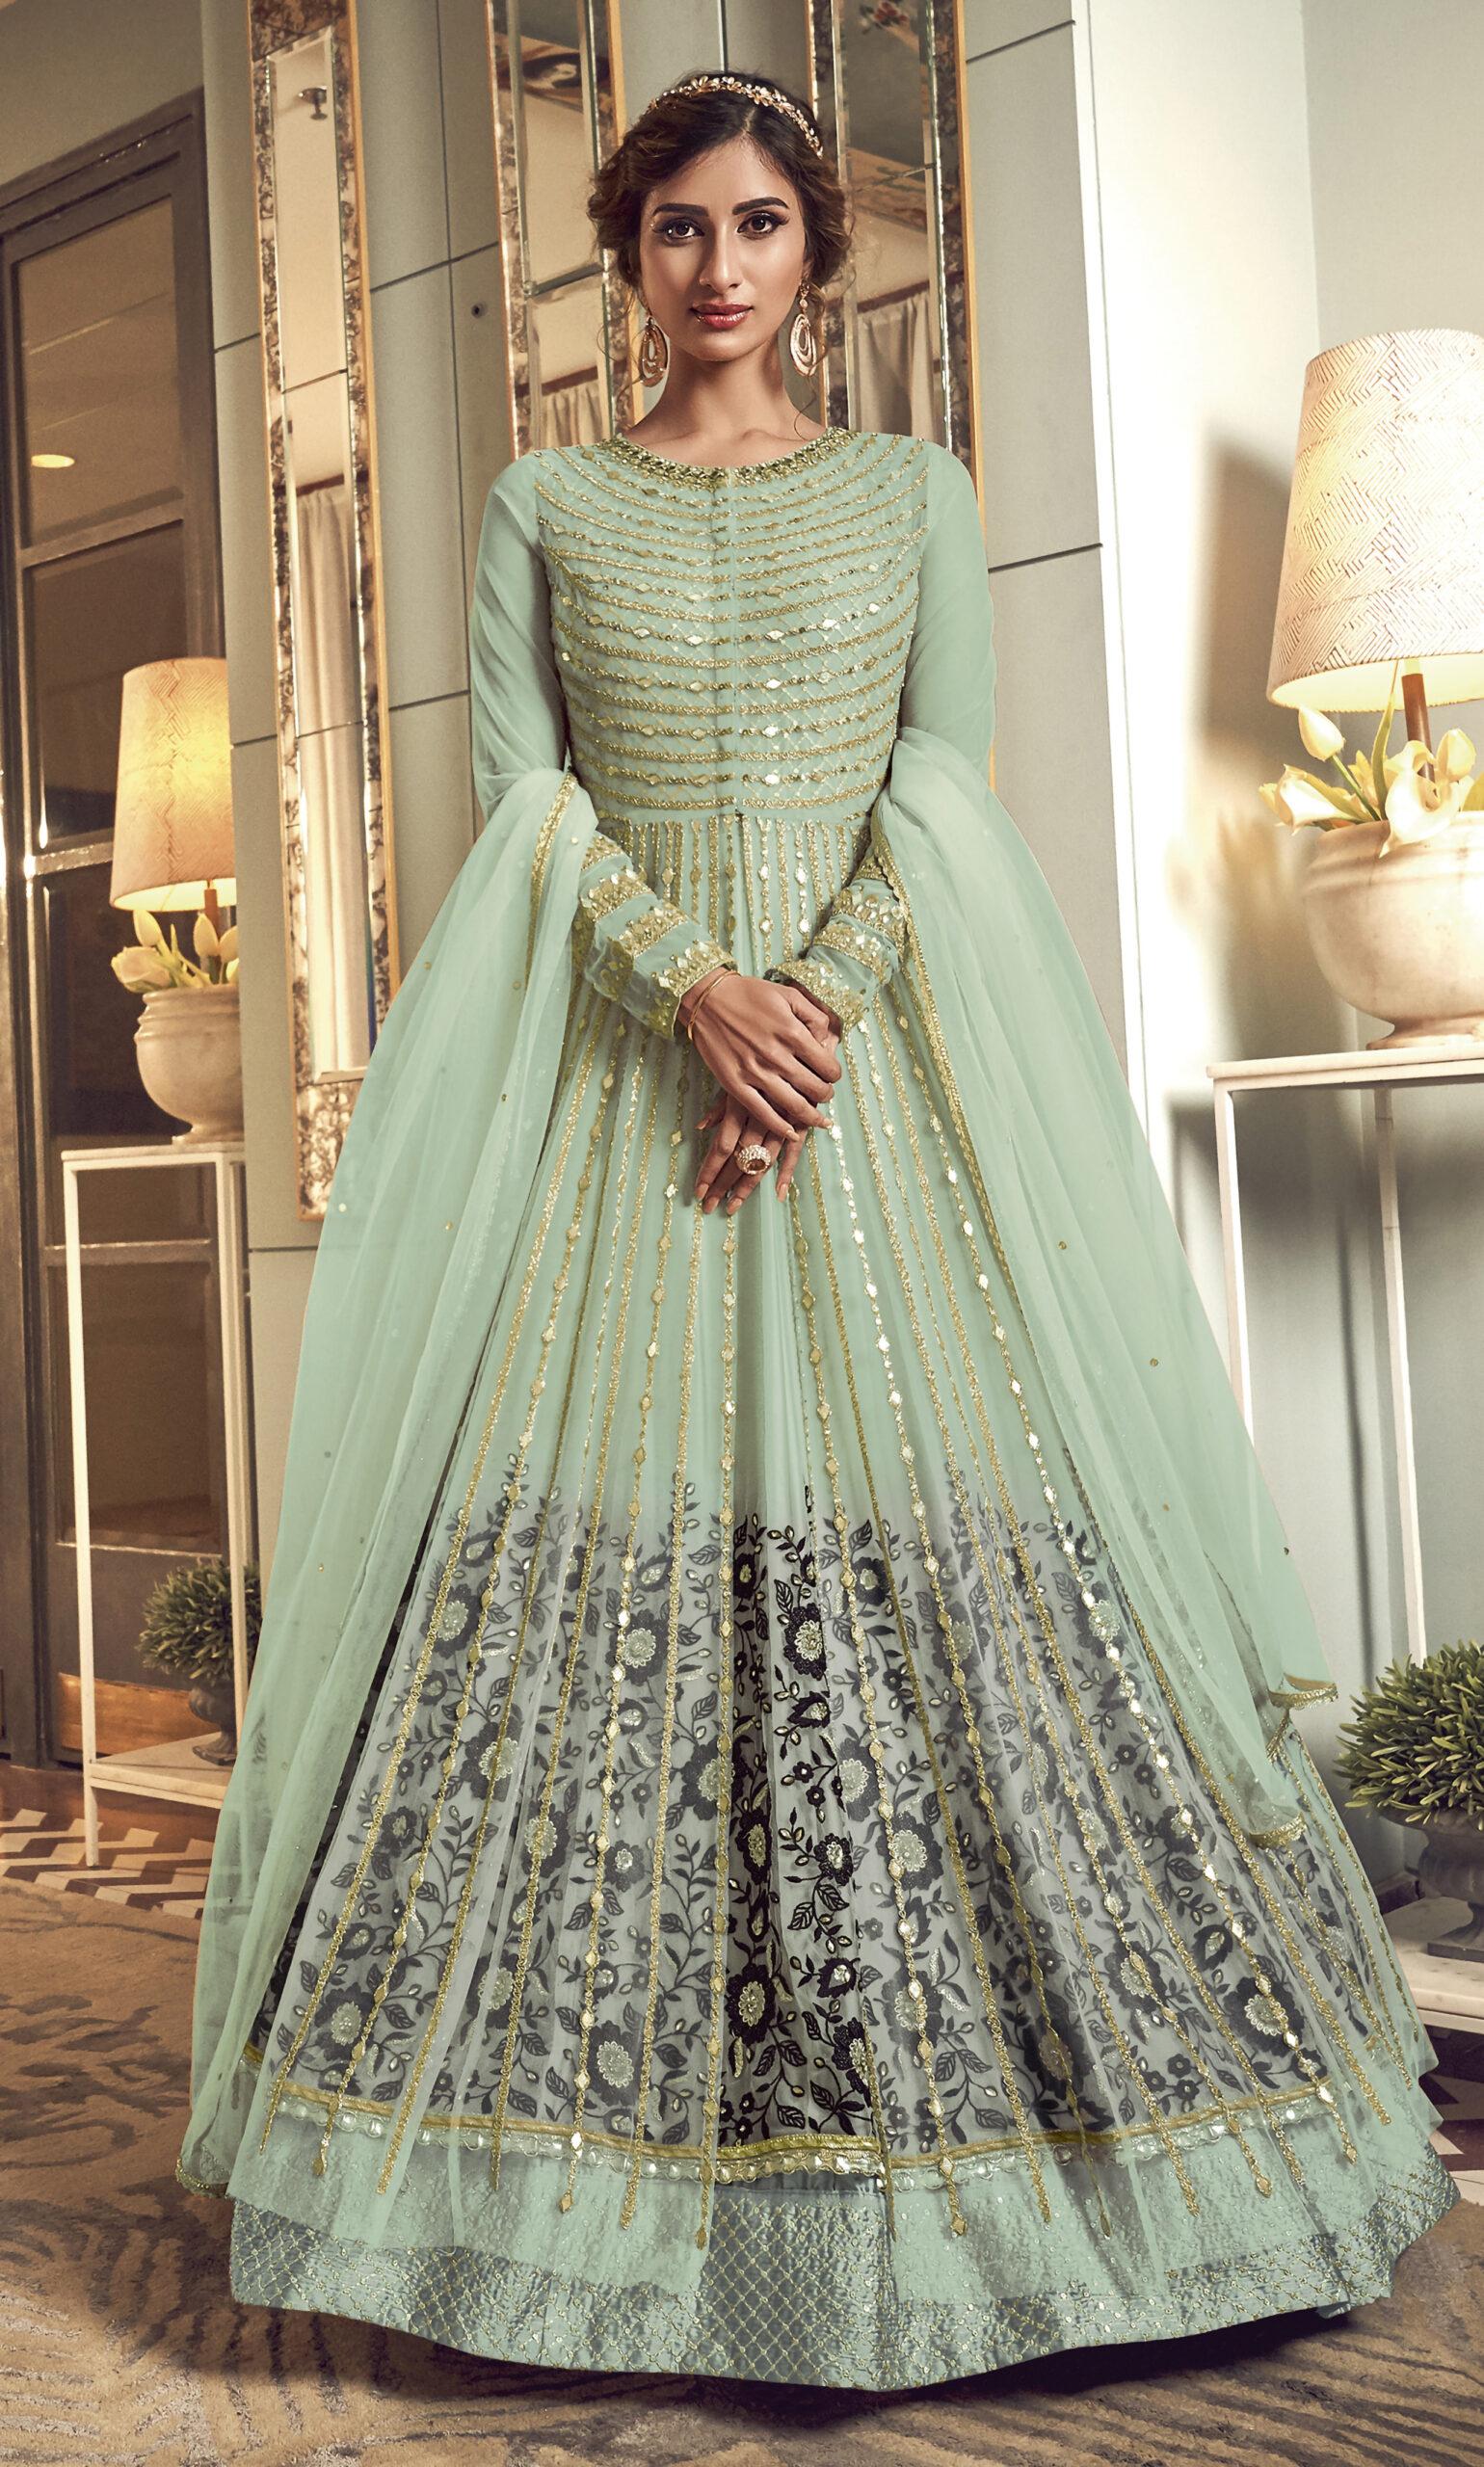 Net Fabrics Pistachio Green Anarkali Suits for Party Wear